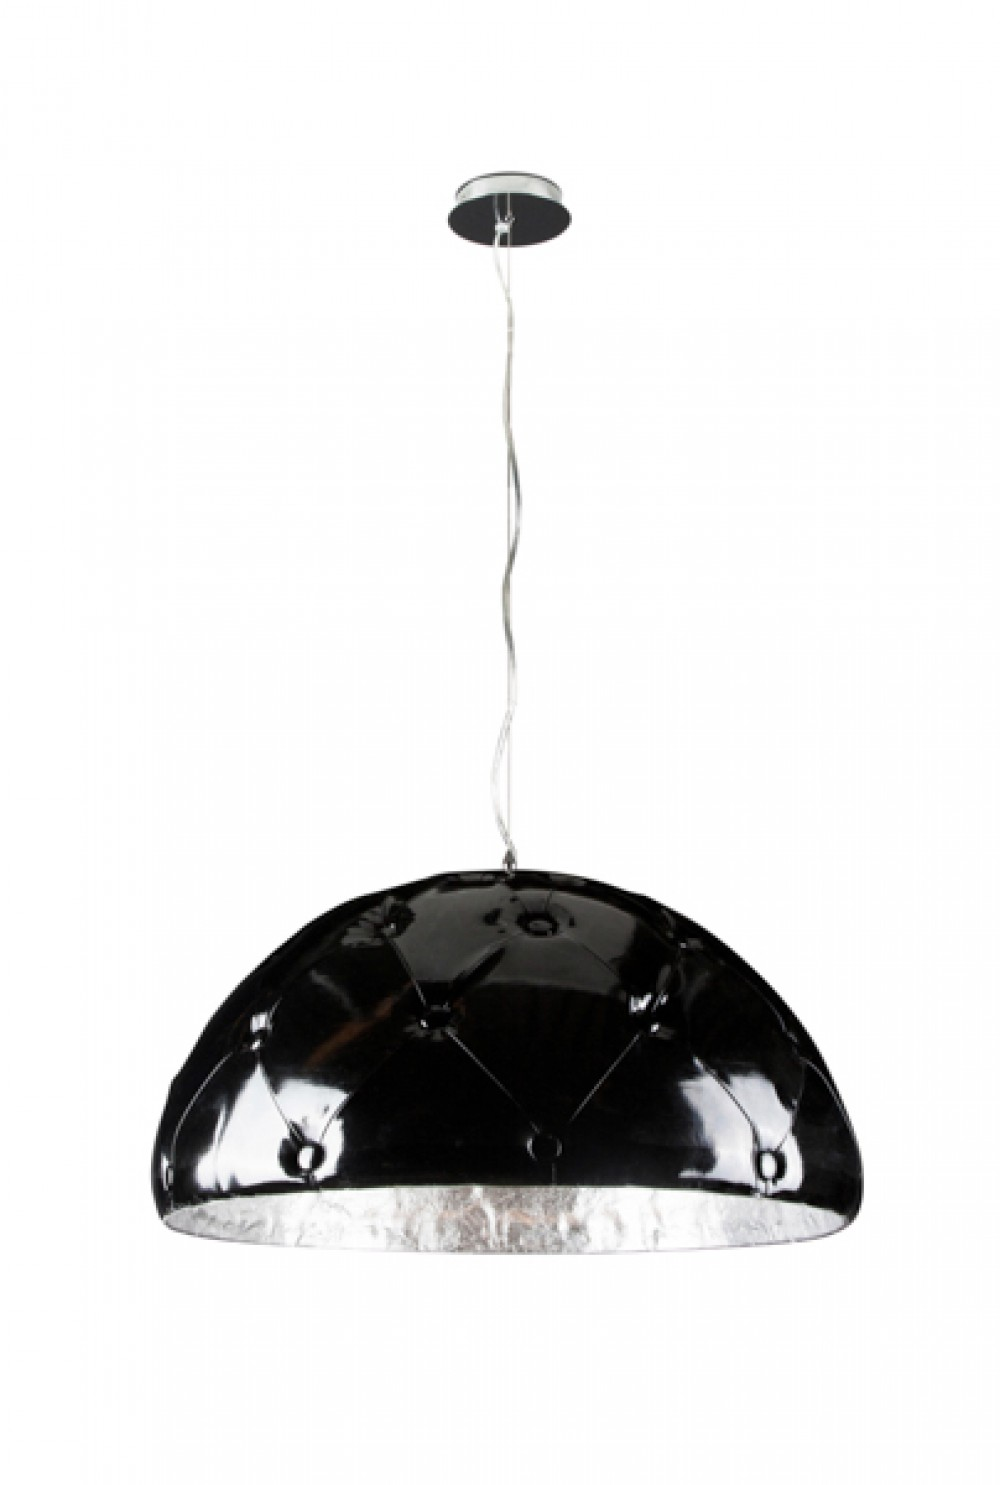 h ngeleuchte schwarz silber pendelleuchte durchmesser 70 cm. Black Bedroom Furniture Sets. Home Design Ideas